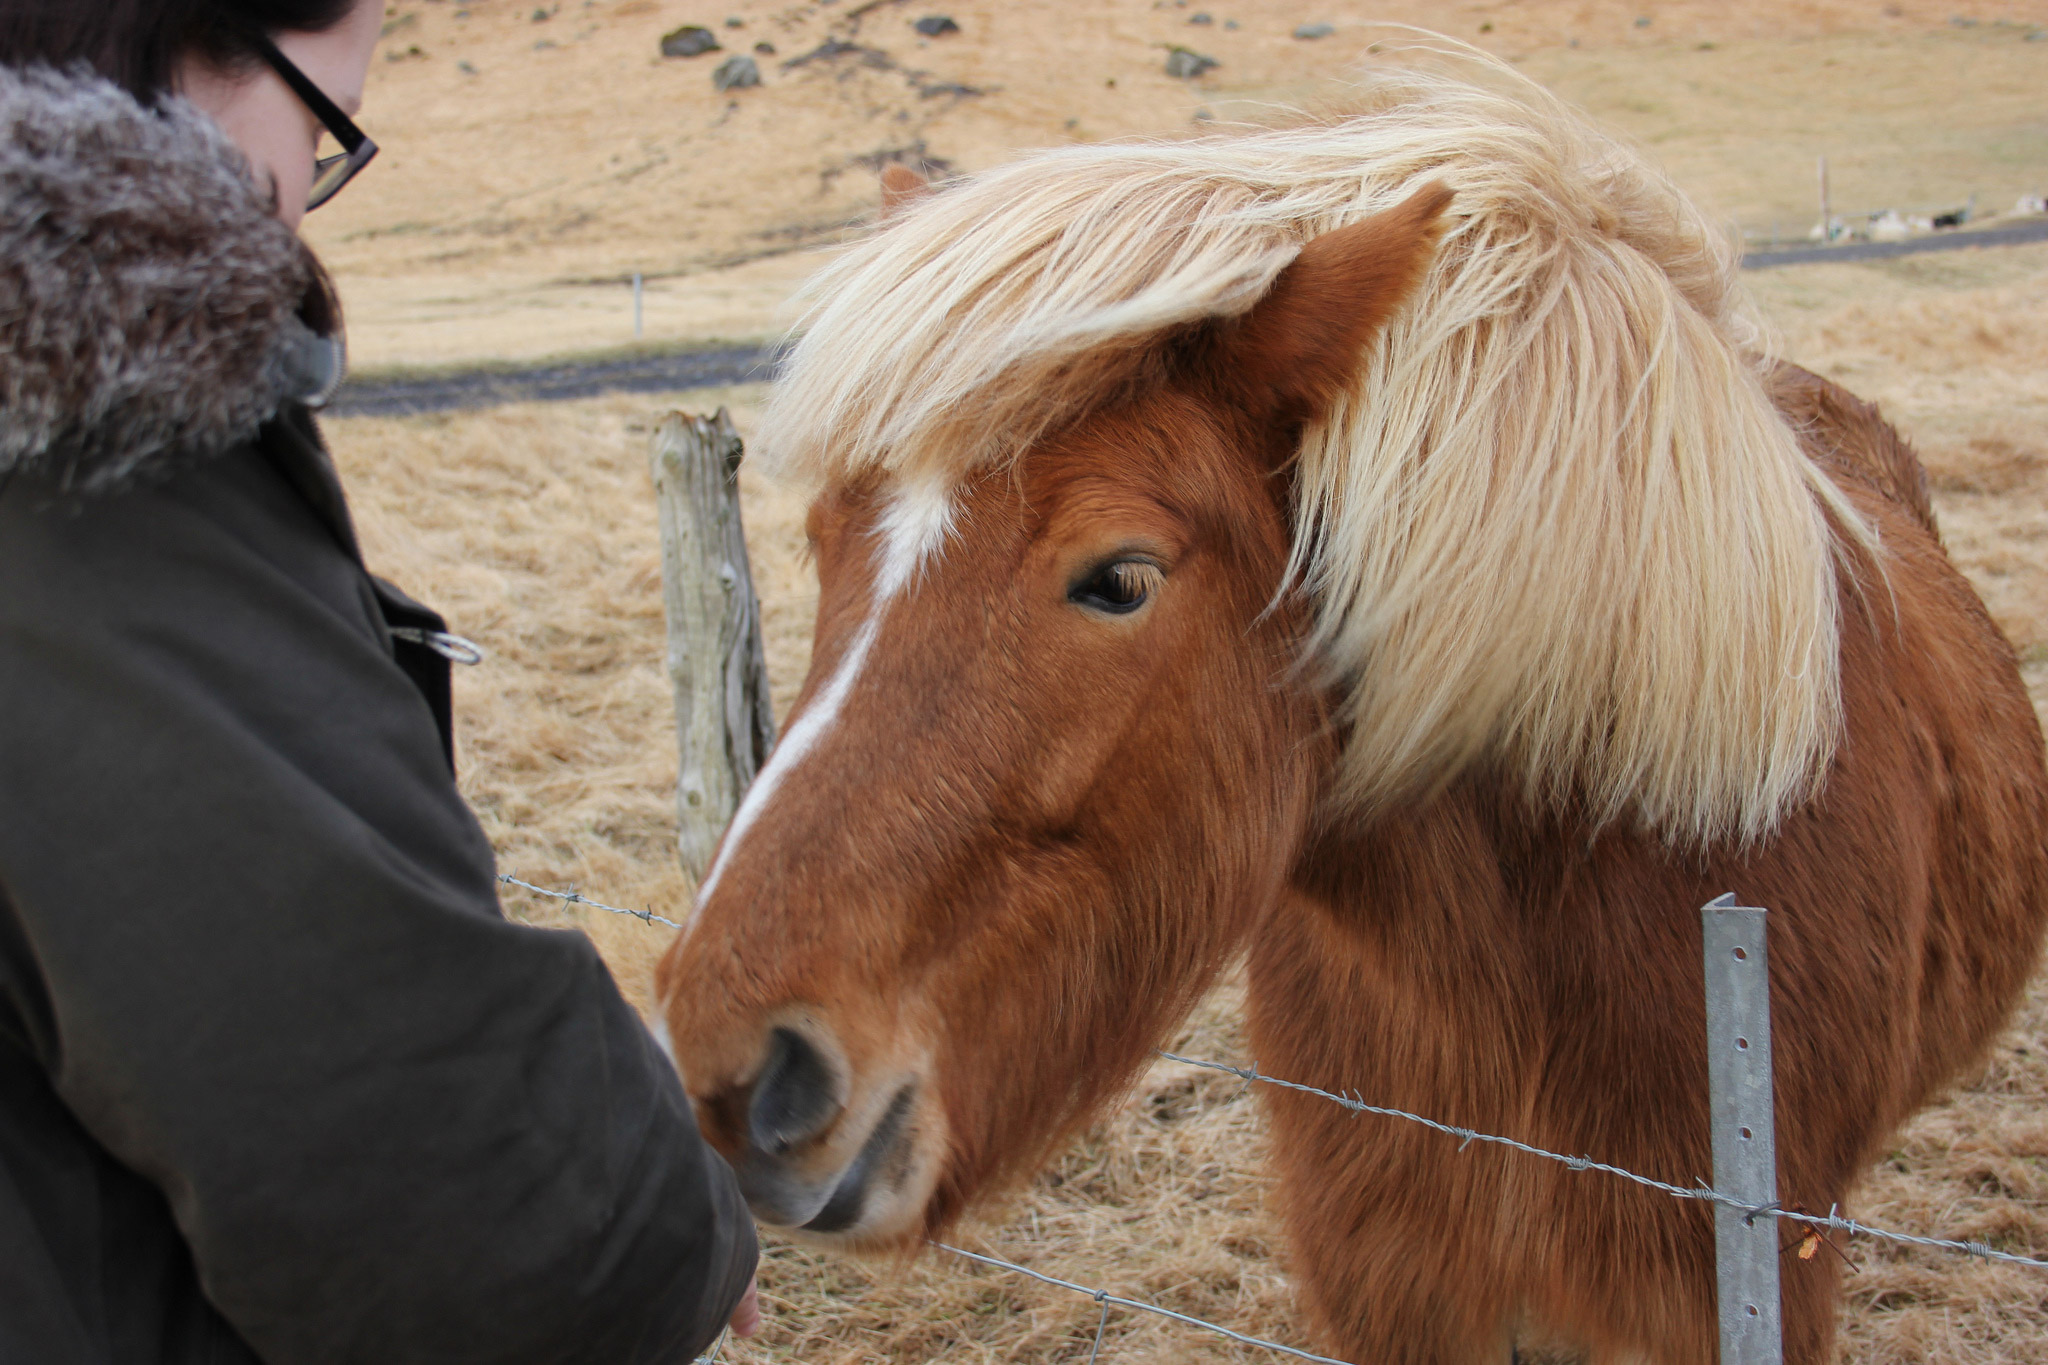 Meeting an Icelandic horse